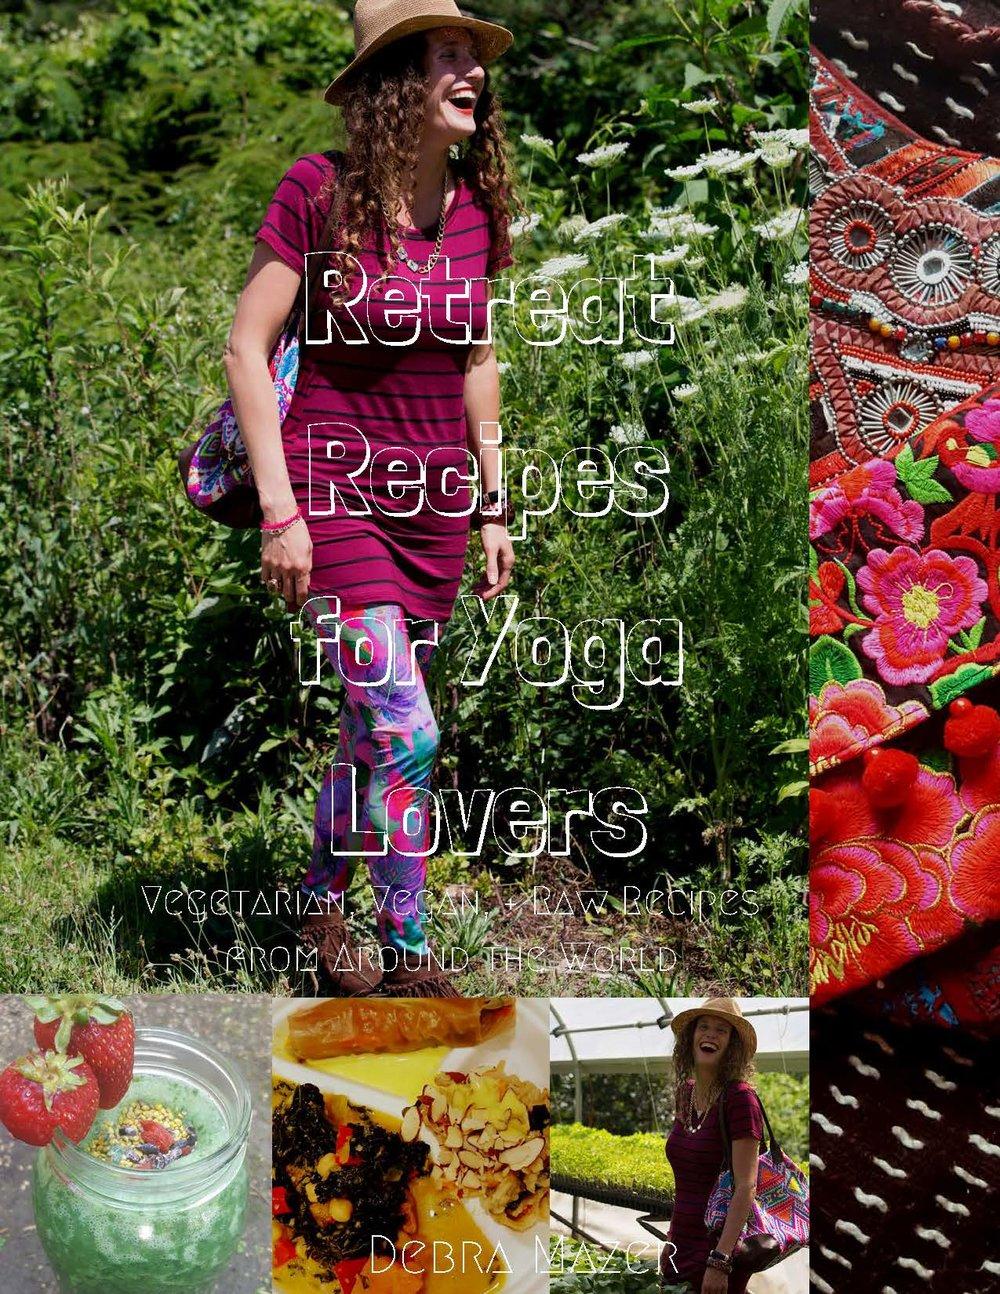 RetreatRecipesFrontCoverDebraMazerEnterprisesLLC.jpg